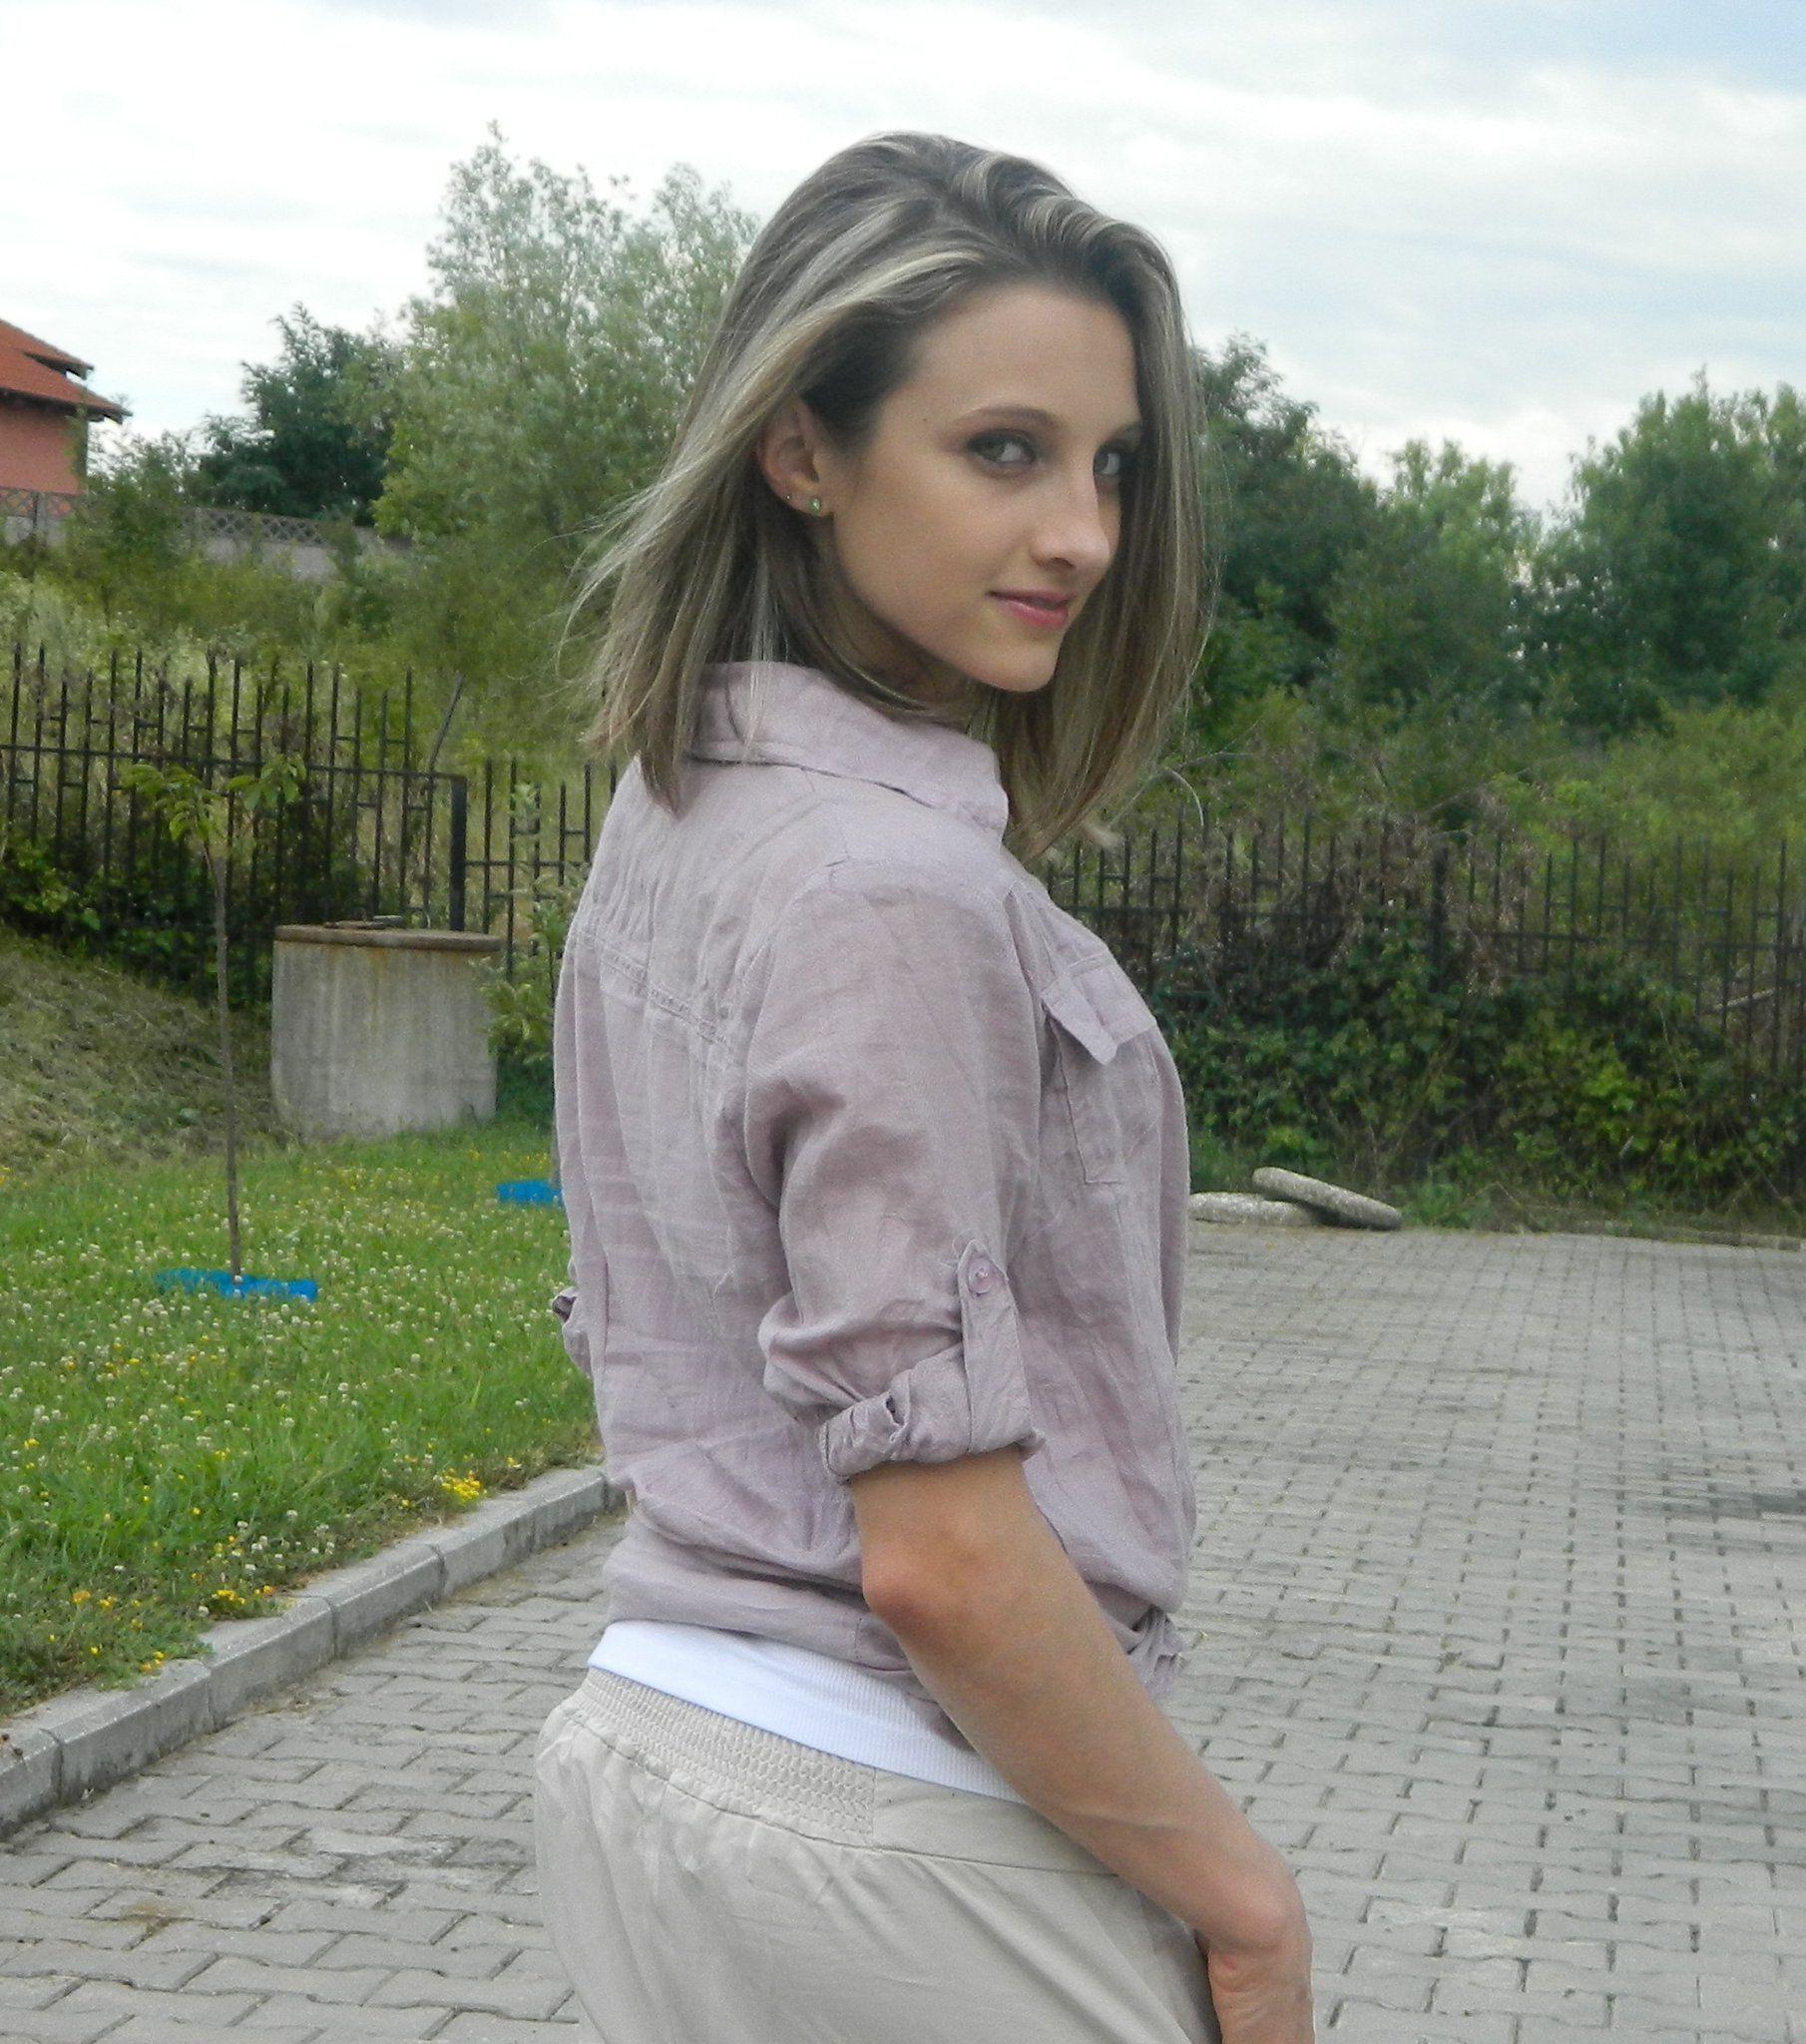 Ana Porgras 2009, gymnastics, gymnast m.27.3 #KyFun from ...  |Ana Porgras